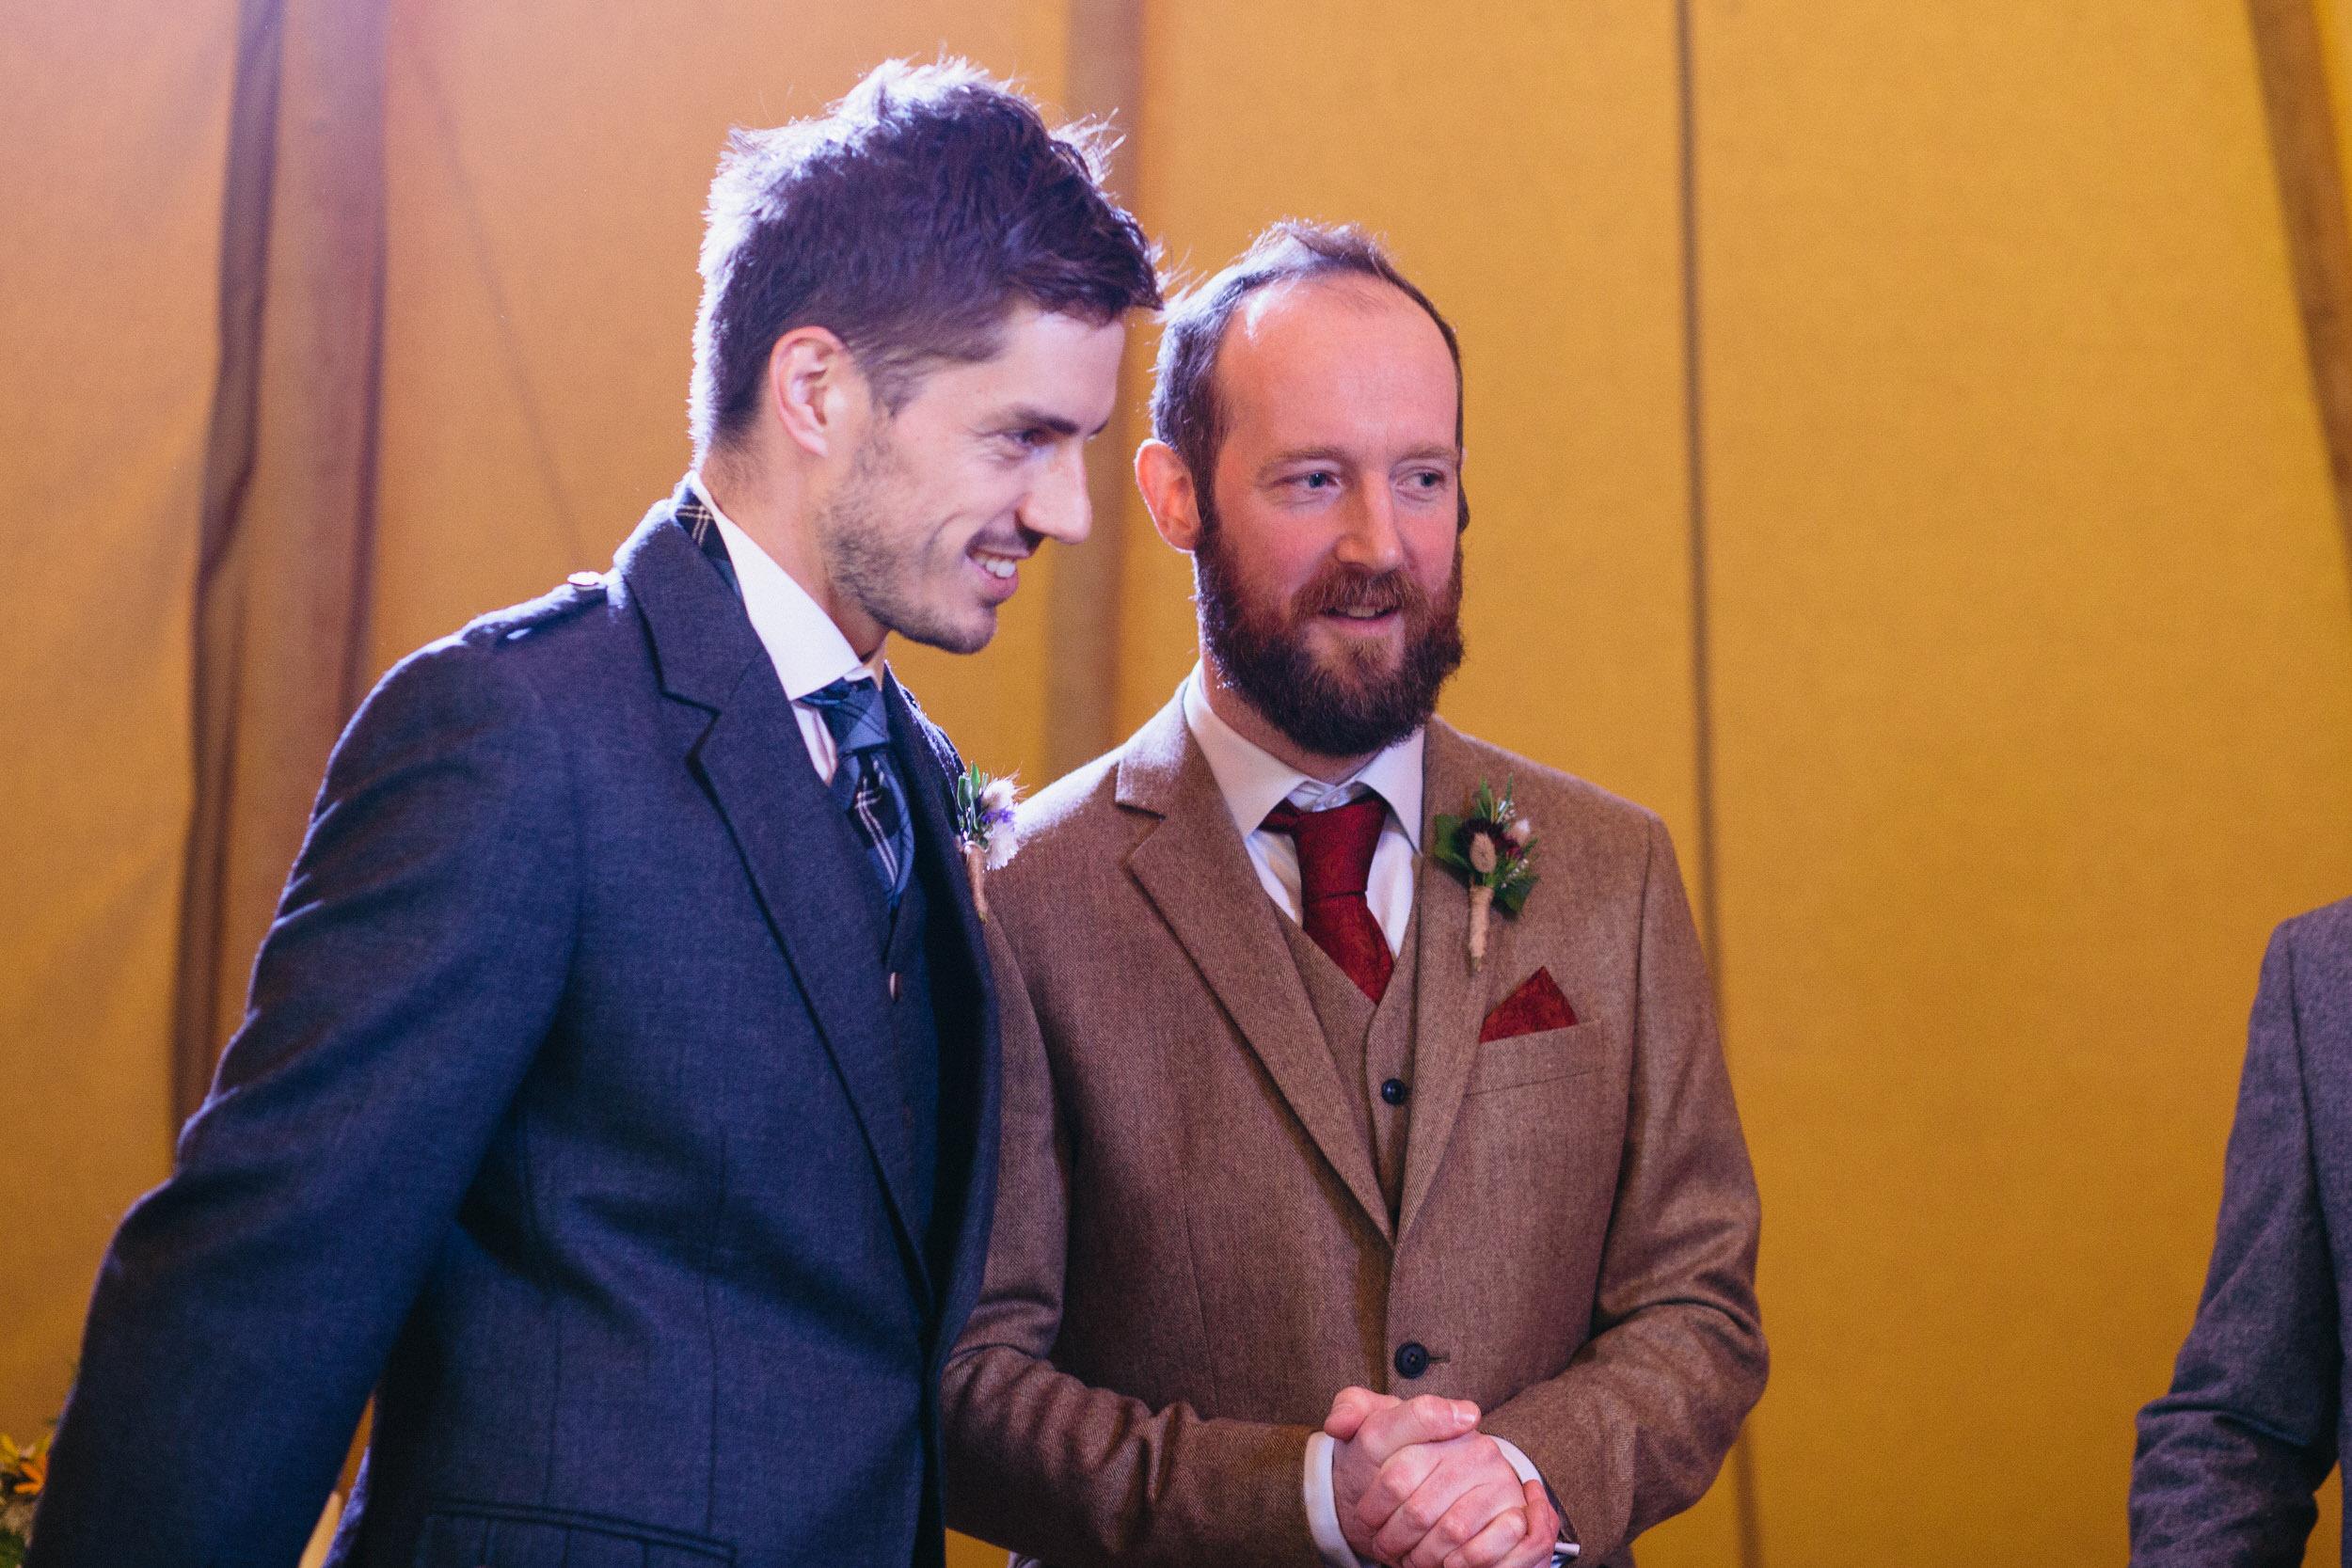 Quirky Wedding Photography Scotland Borders Biggar Hartree 023.jpg